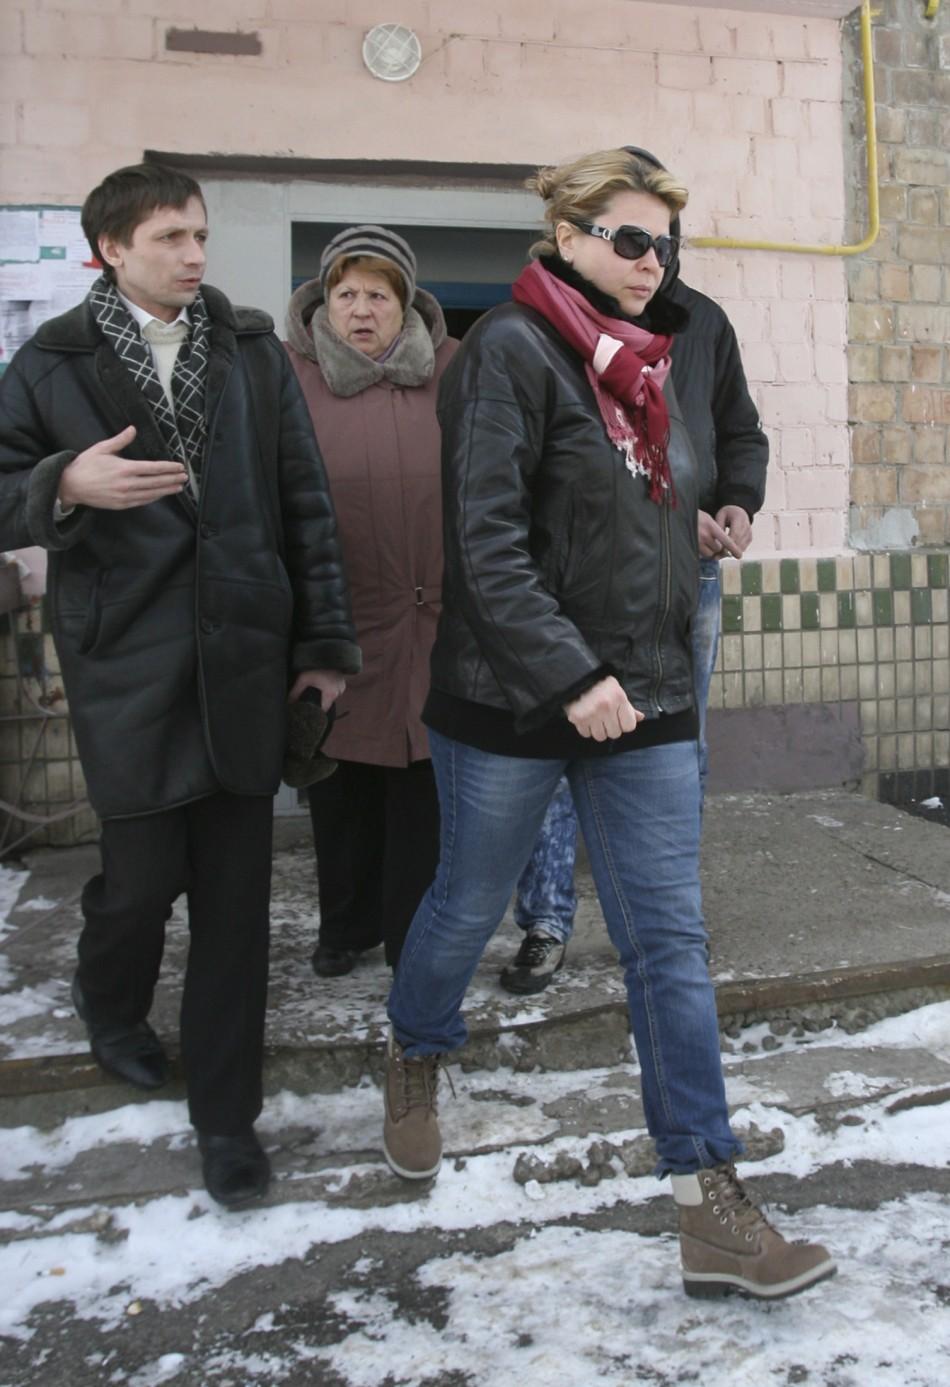 Gadhafi's Ukrainian nurse Galyna Kolotnytska